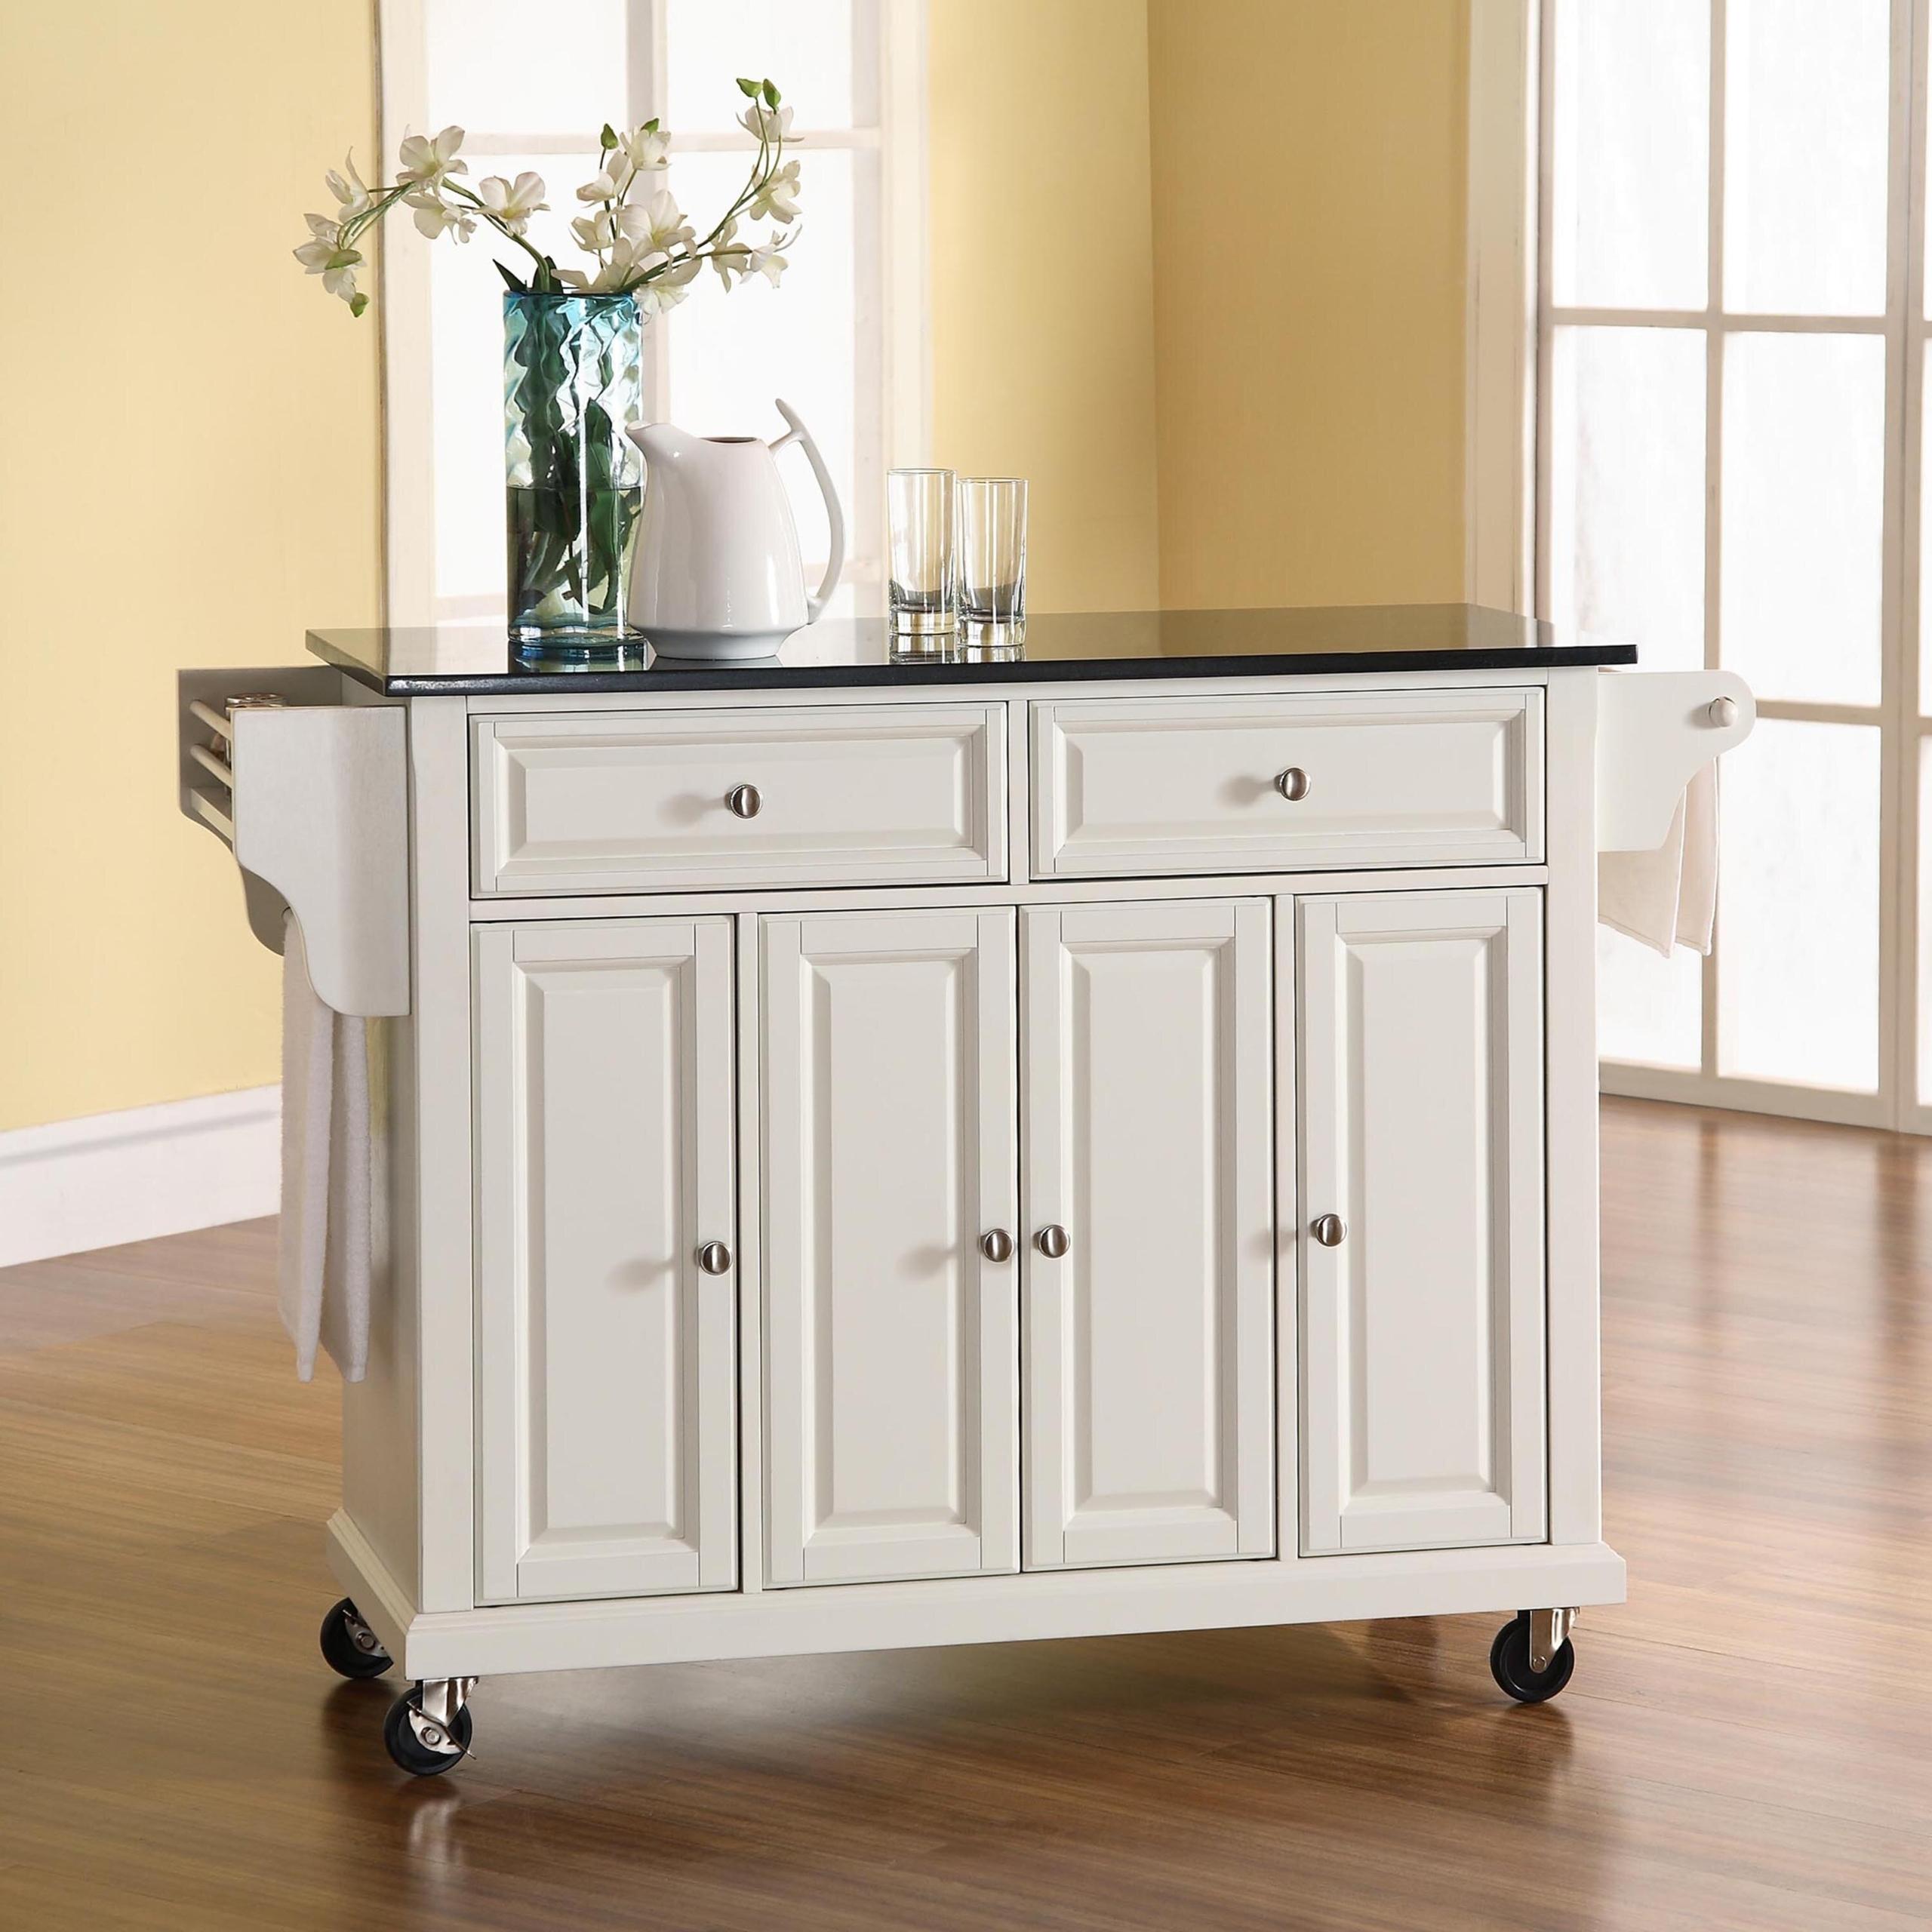 Kitchen Island Cart Granite Top Ideas On Foter